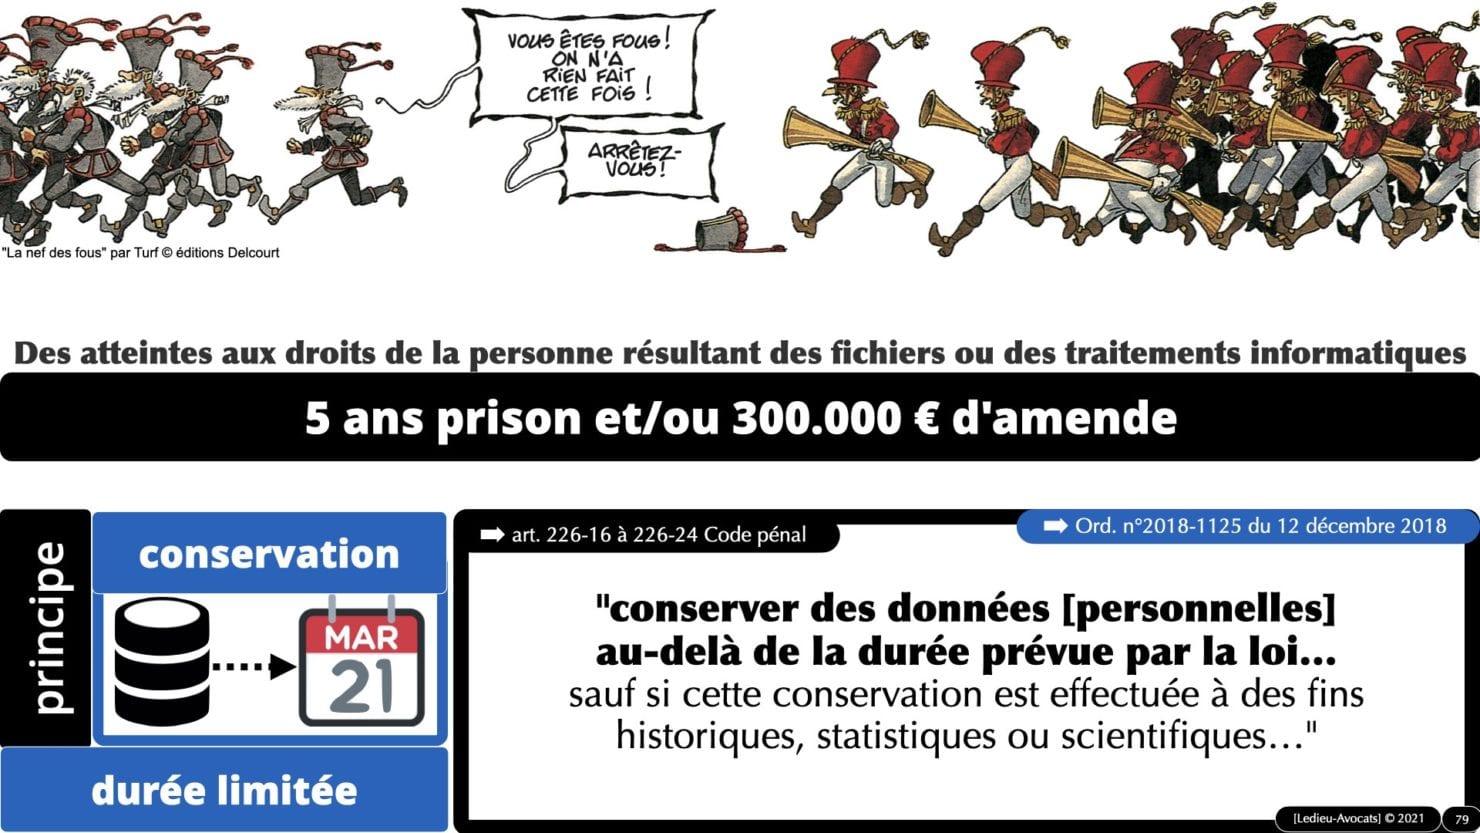 RGPD e-Privacy principes actualité jurisprudence ©Ledieu-Avocats 25-06-2021.079